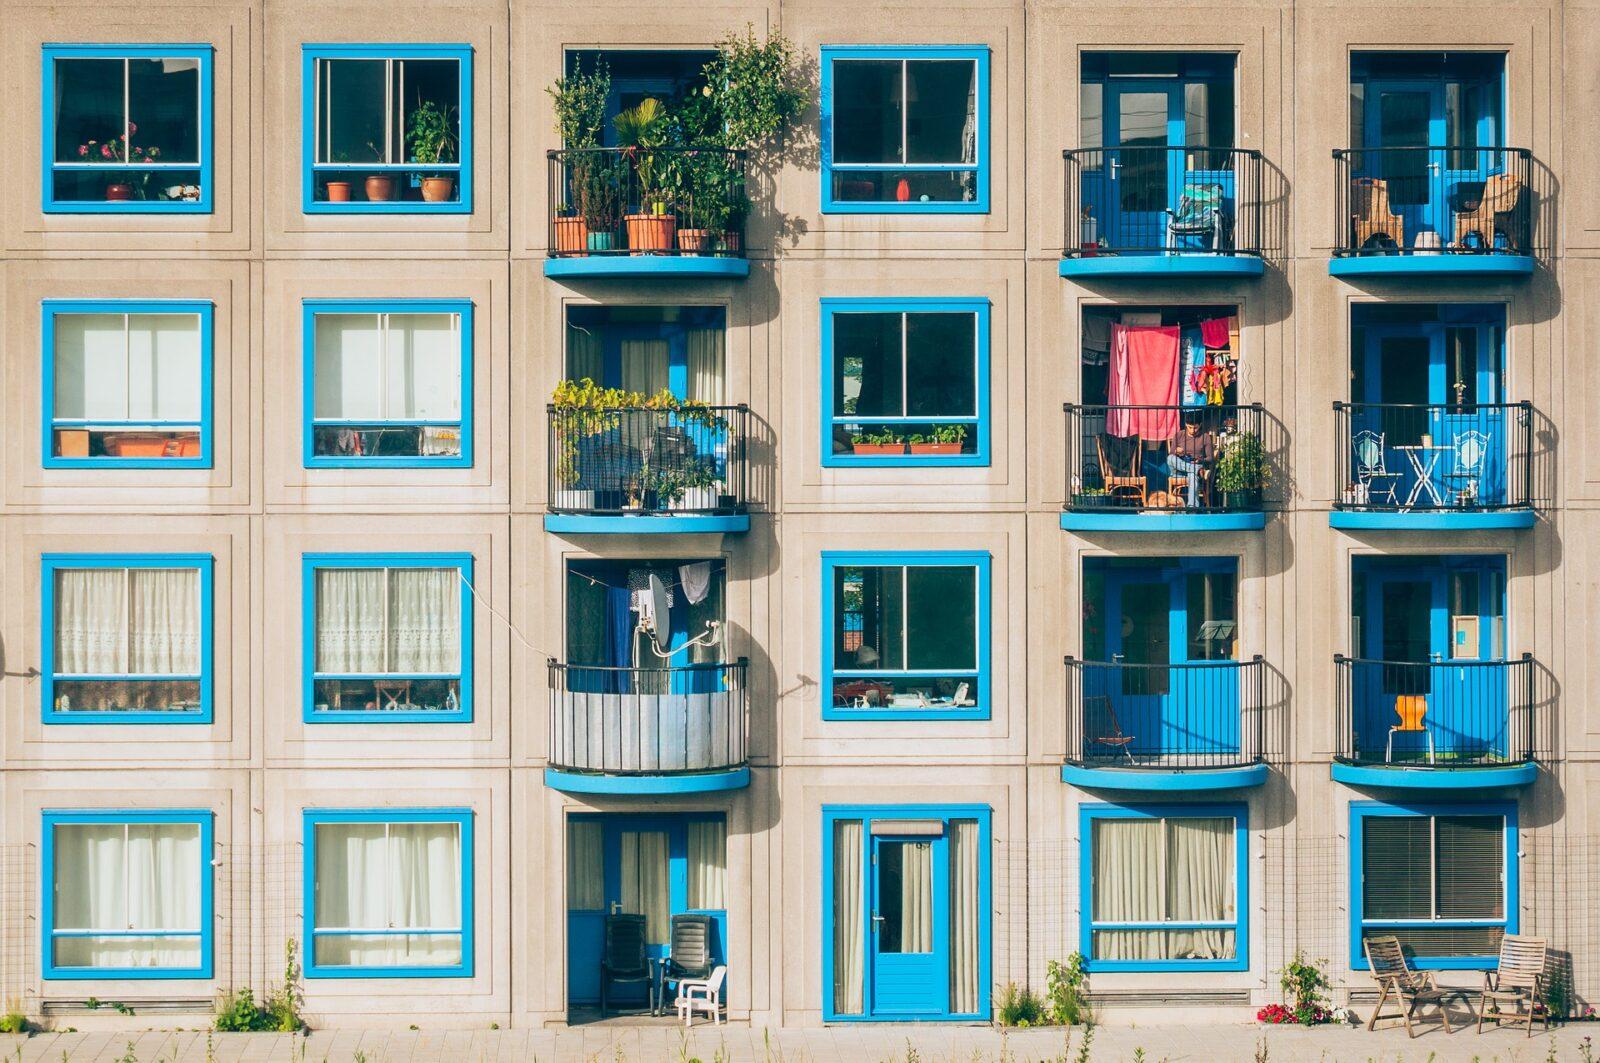 apartments 1845884 1920 2